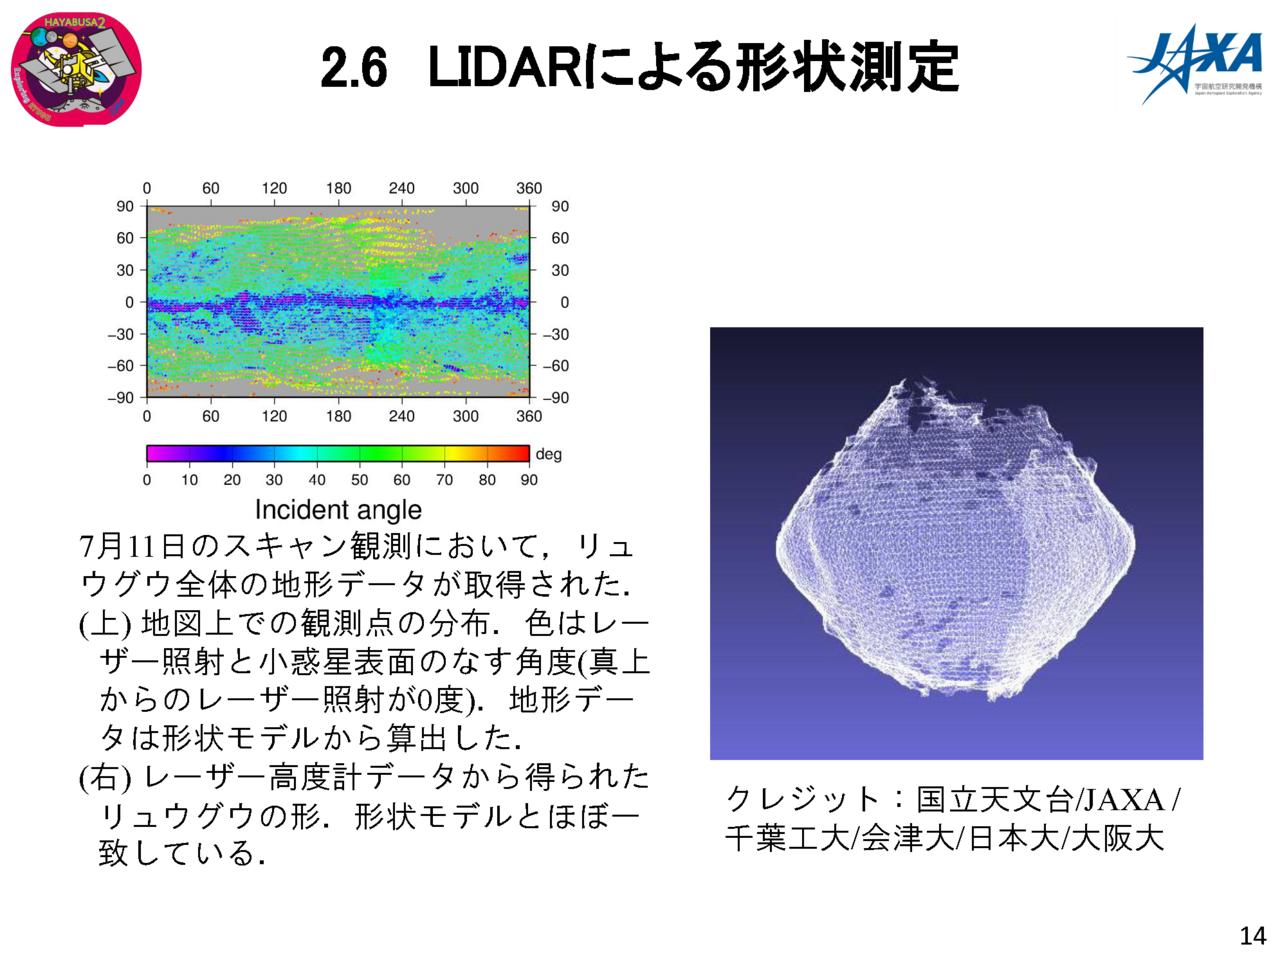 f:id:Imamura:20180719131709p:plain